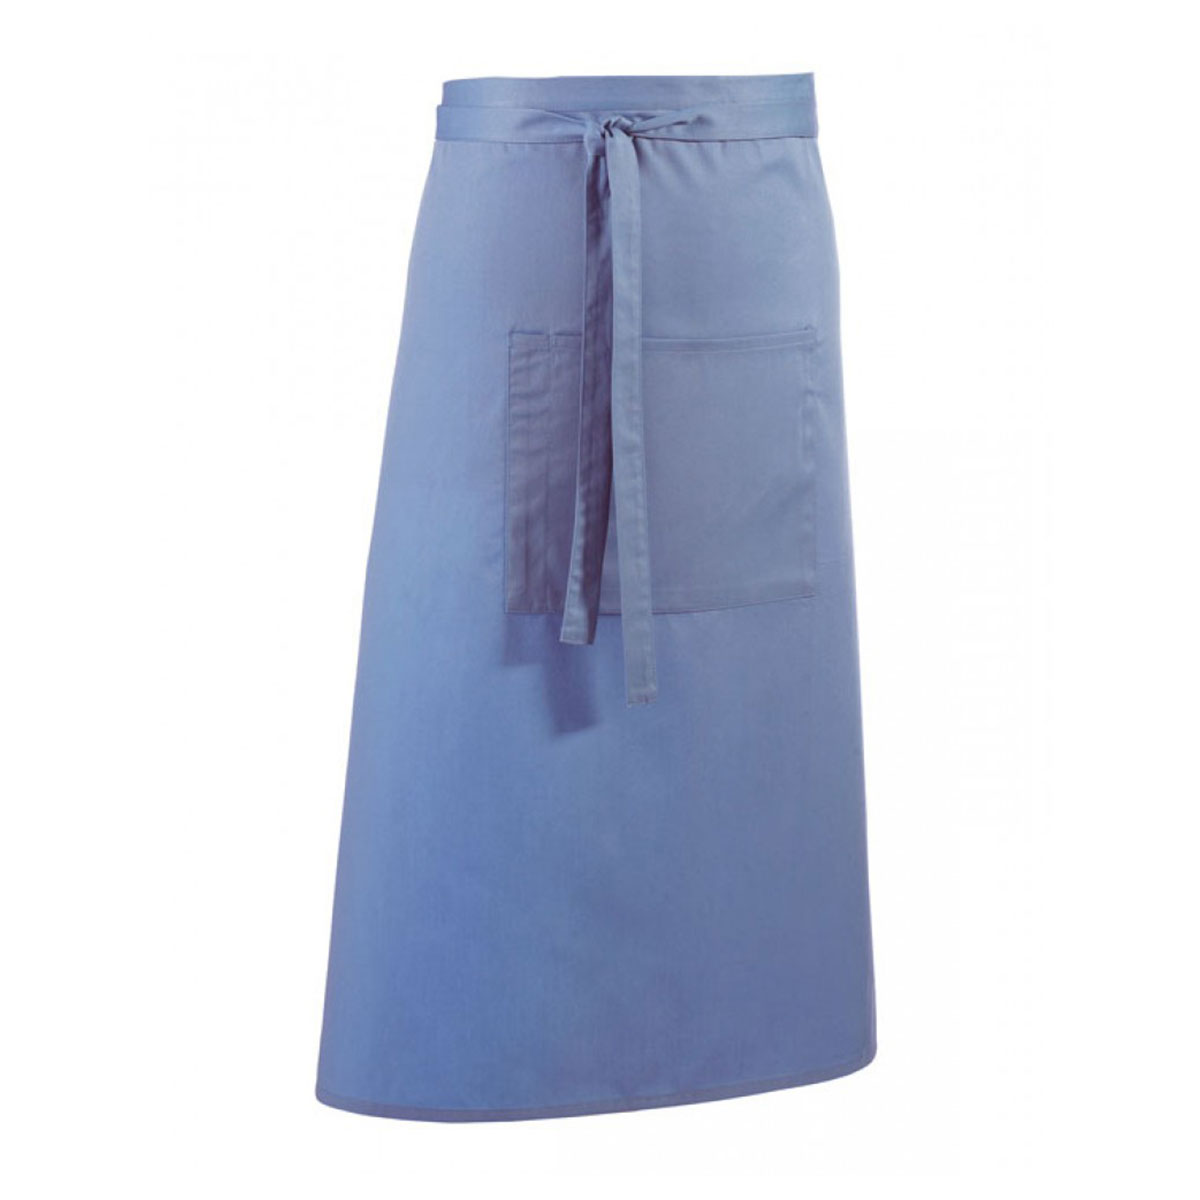 Colours Hospitality Apron - pr158_mid-blue